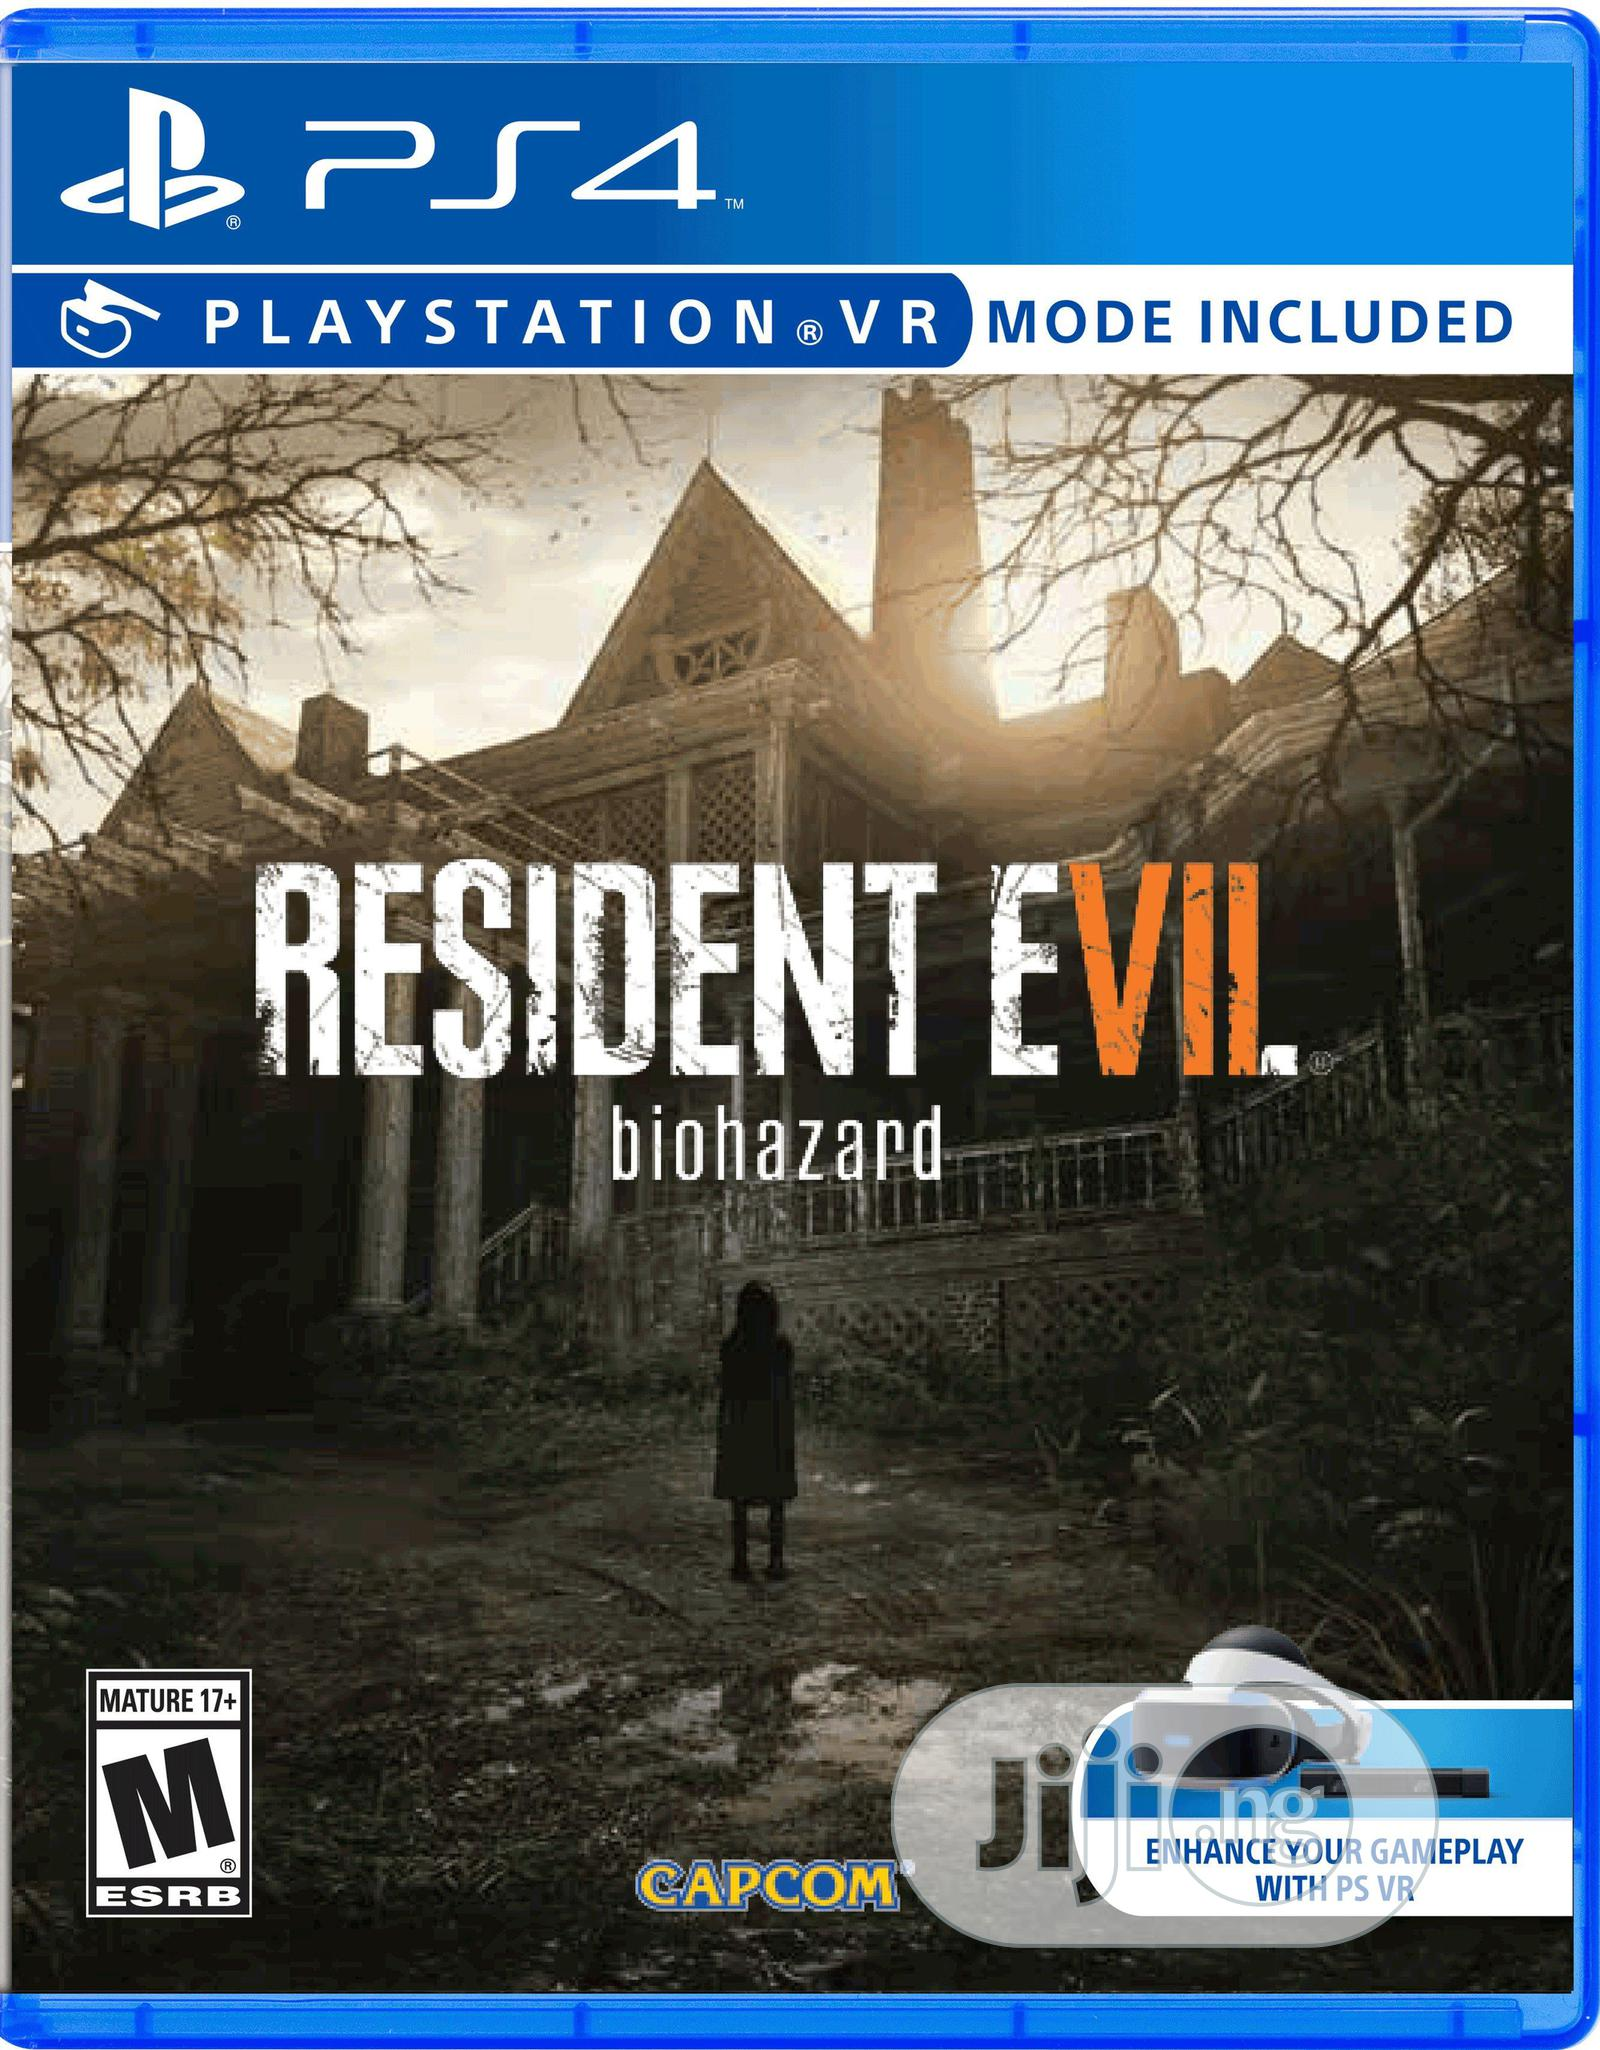 Resident Evil Ps4 Game (Biohazard)